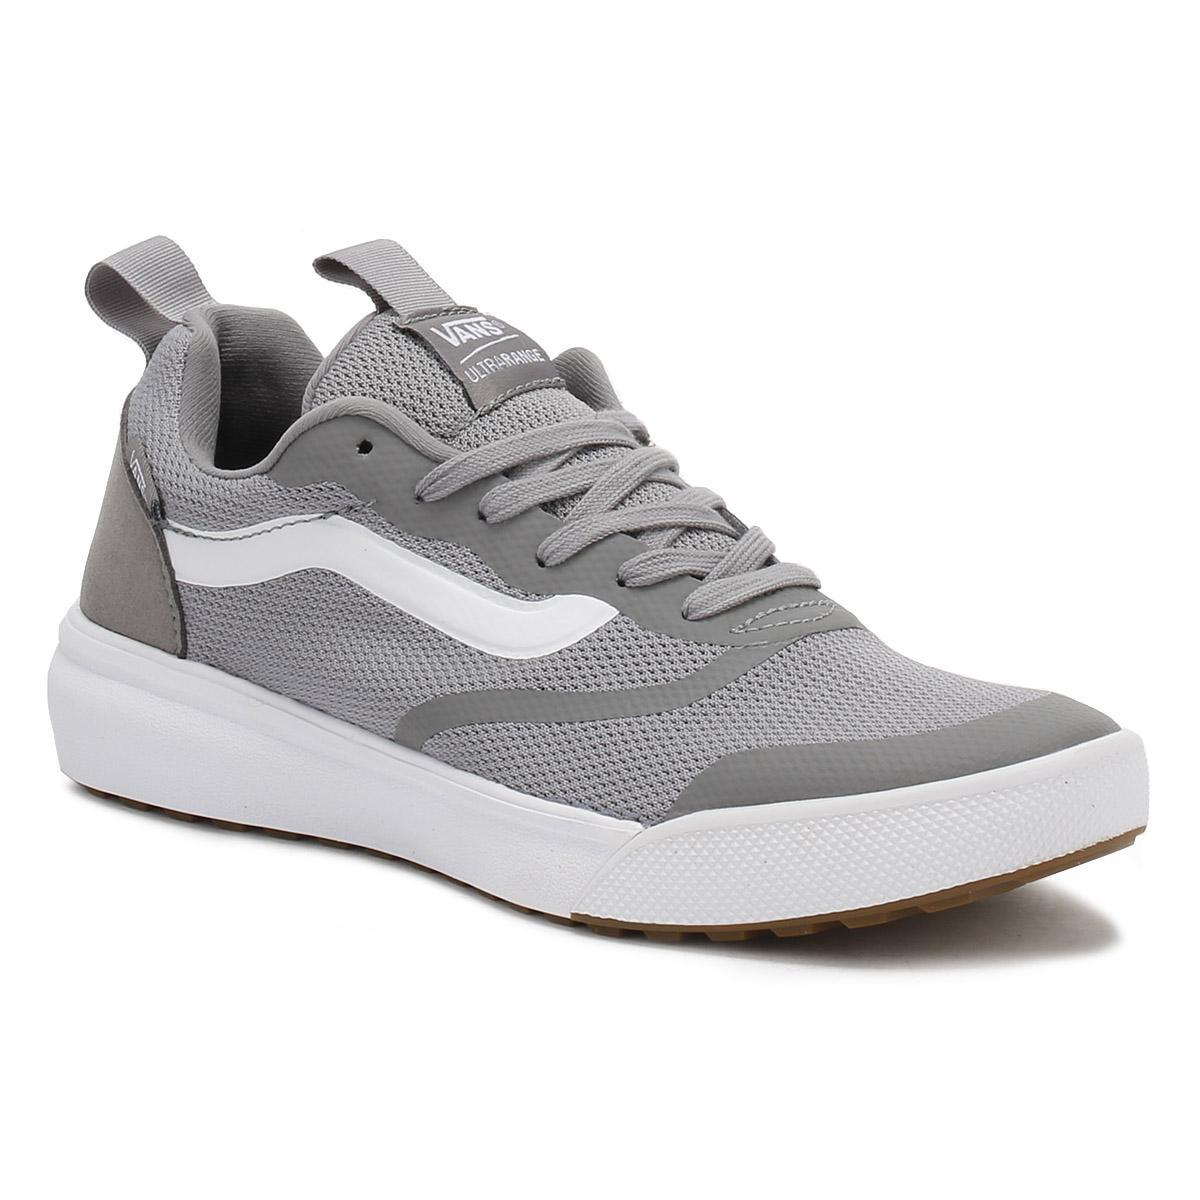 ff2553ad67b58b Lyst - Vans Mens Grey Ultrarange Trainers in Gray for Men